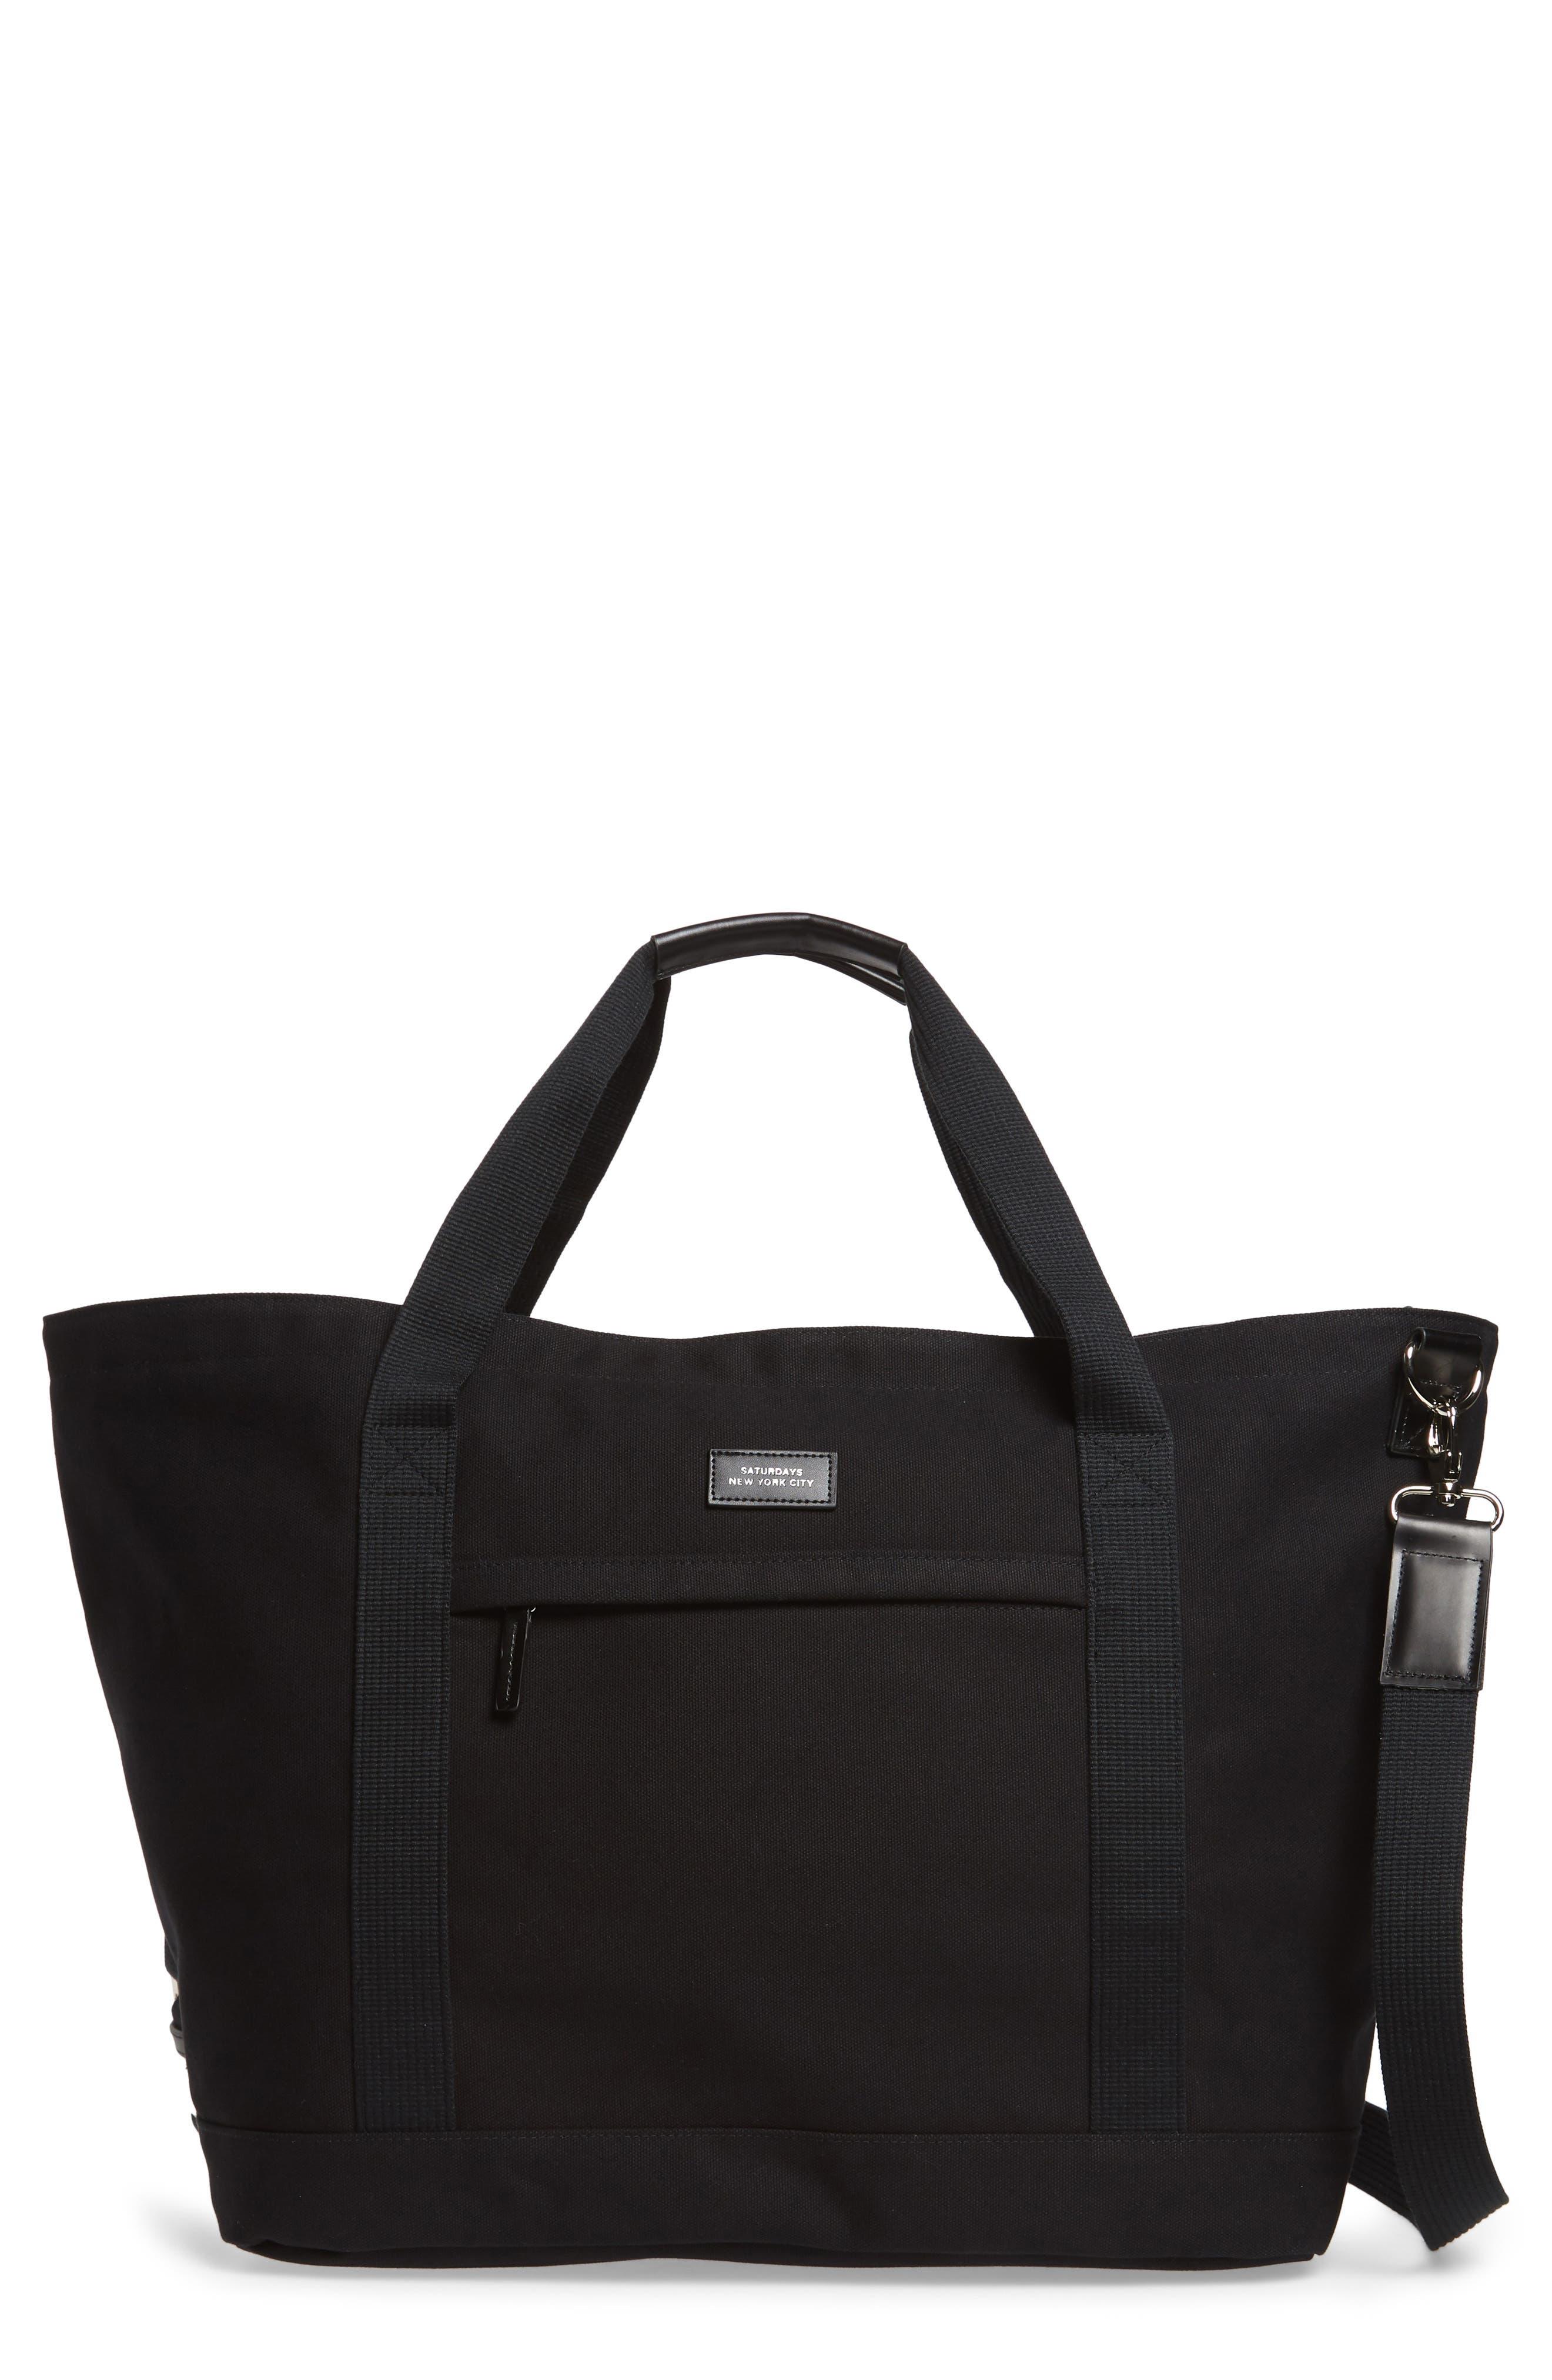 Weekend Water Repellent Tote Bag,                             Main thumbnail 1, color,                             Black